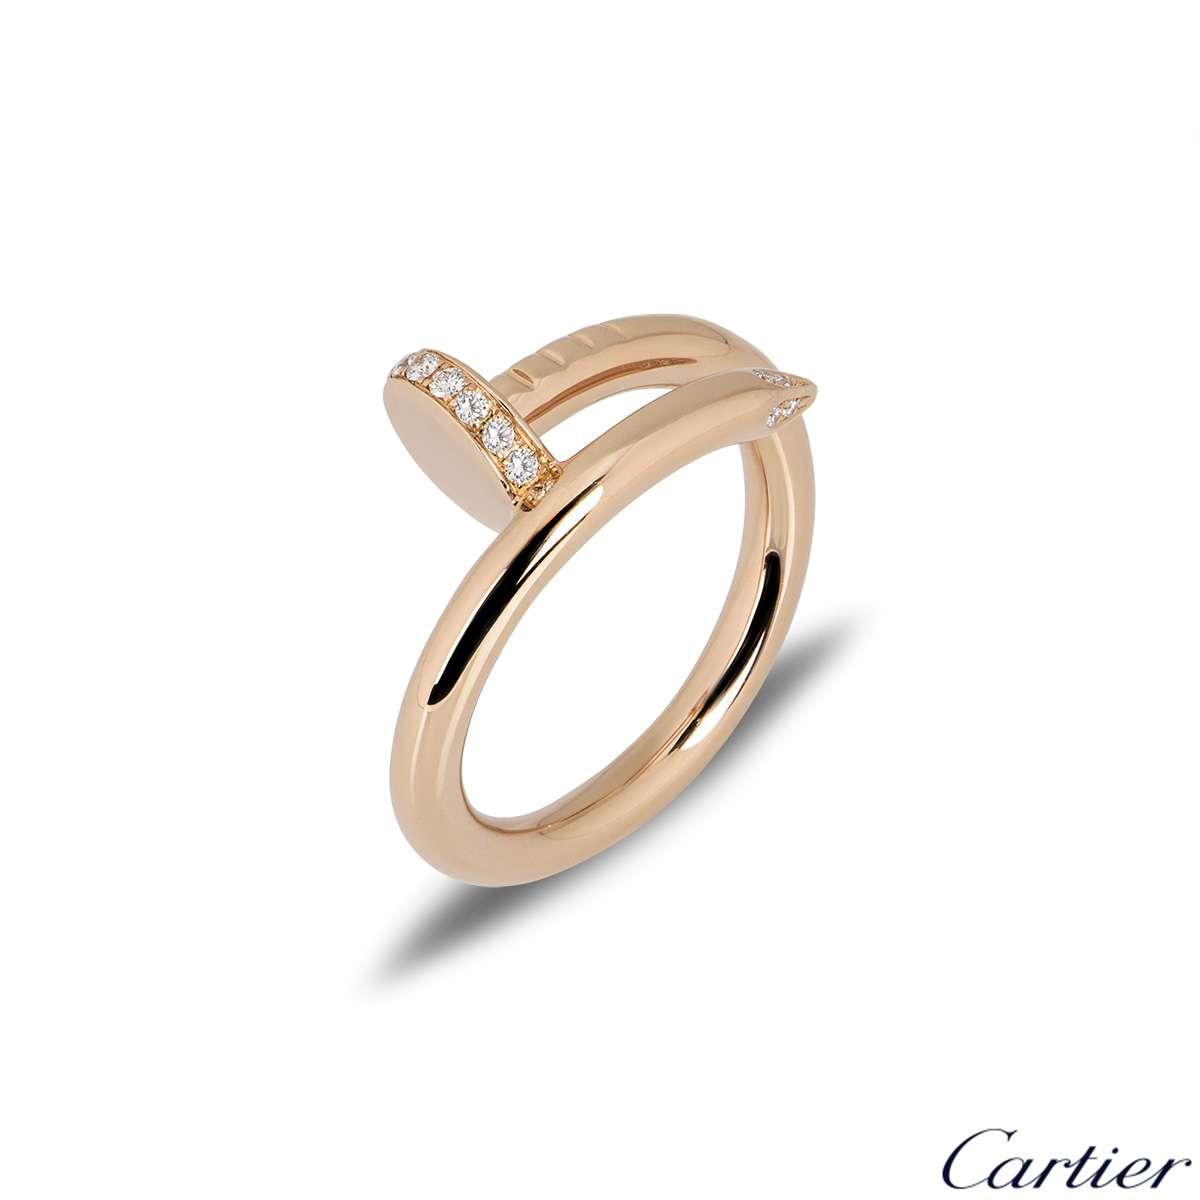 Cartier Rose Gold Diamond Juste Un Clou Ring Size 52 B4094800